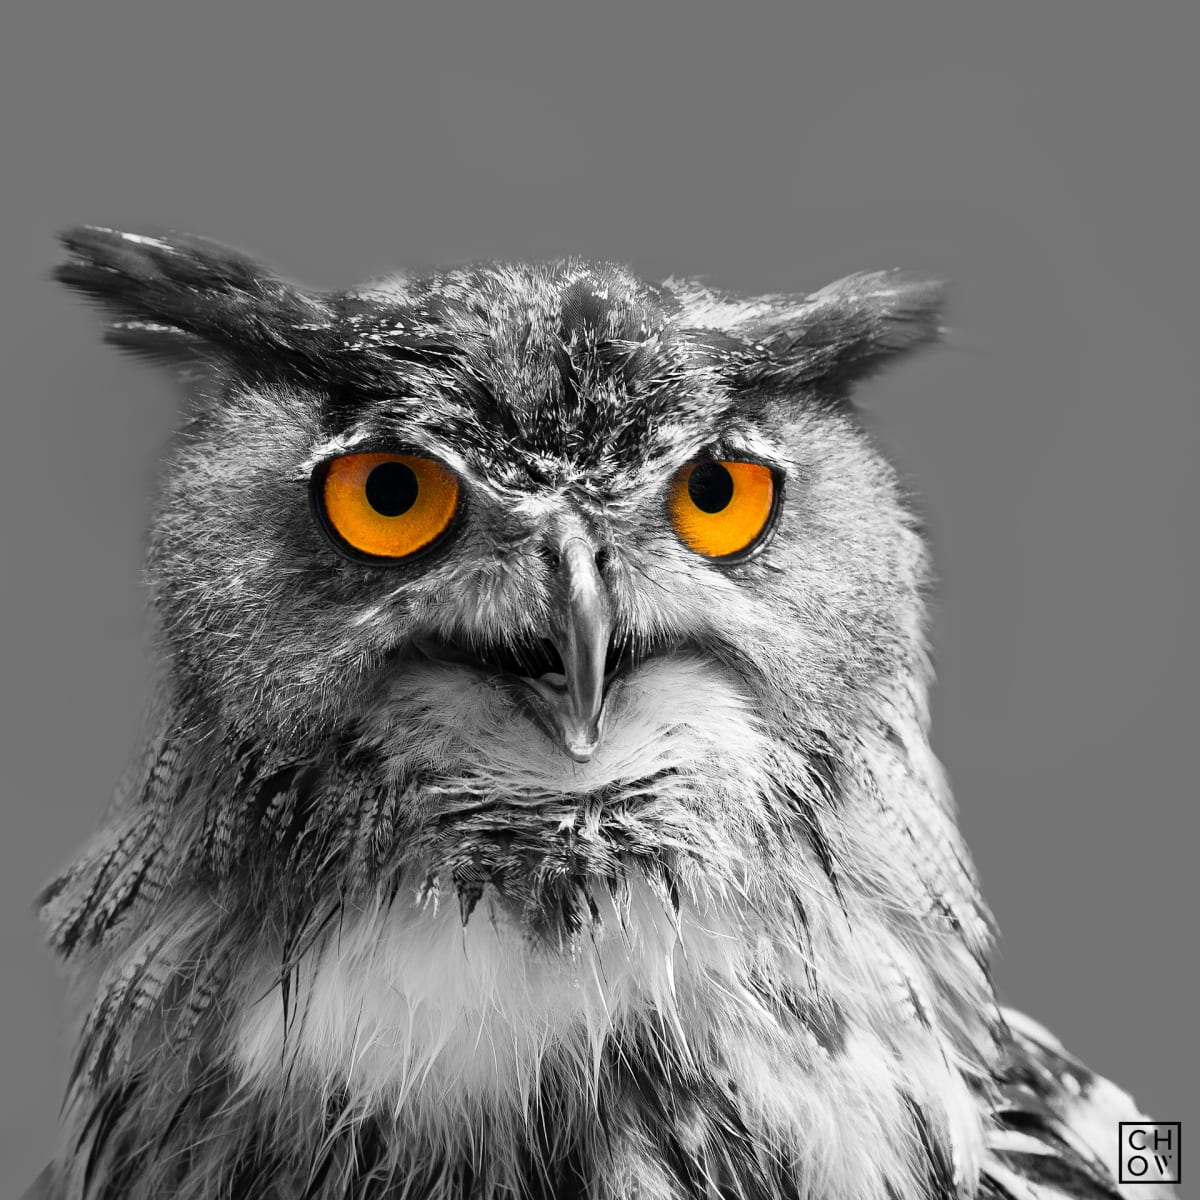 Austin Chow, One // Owl Eyes, 2016